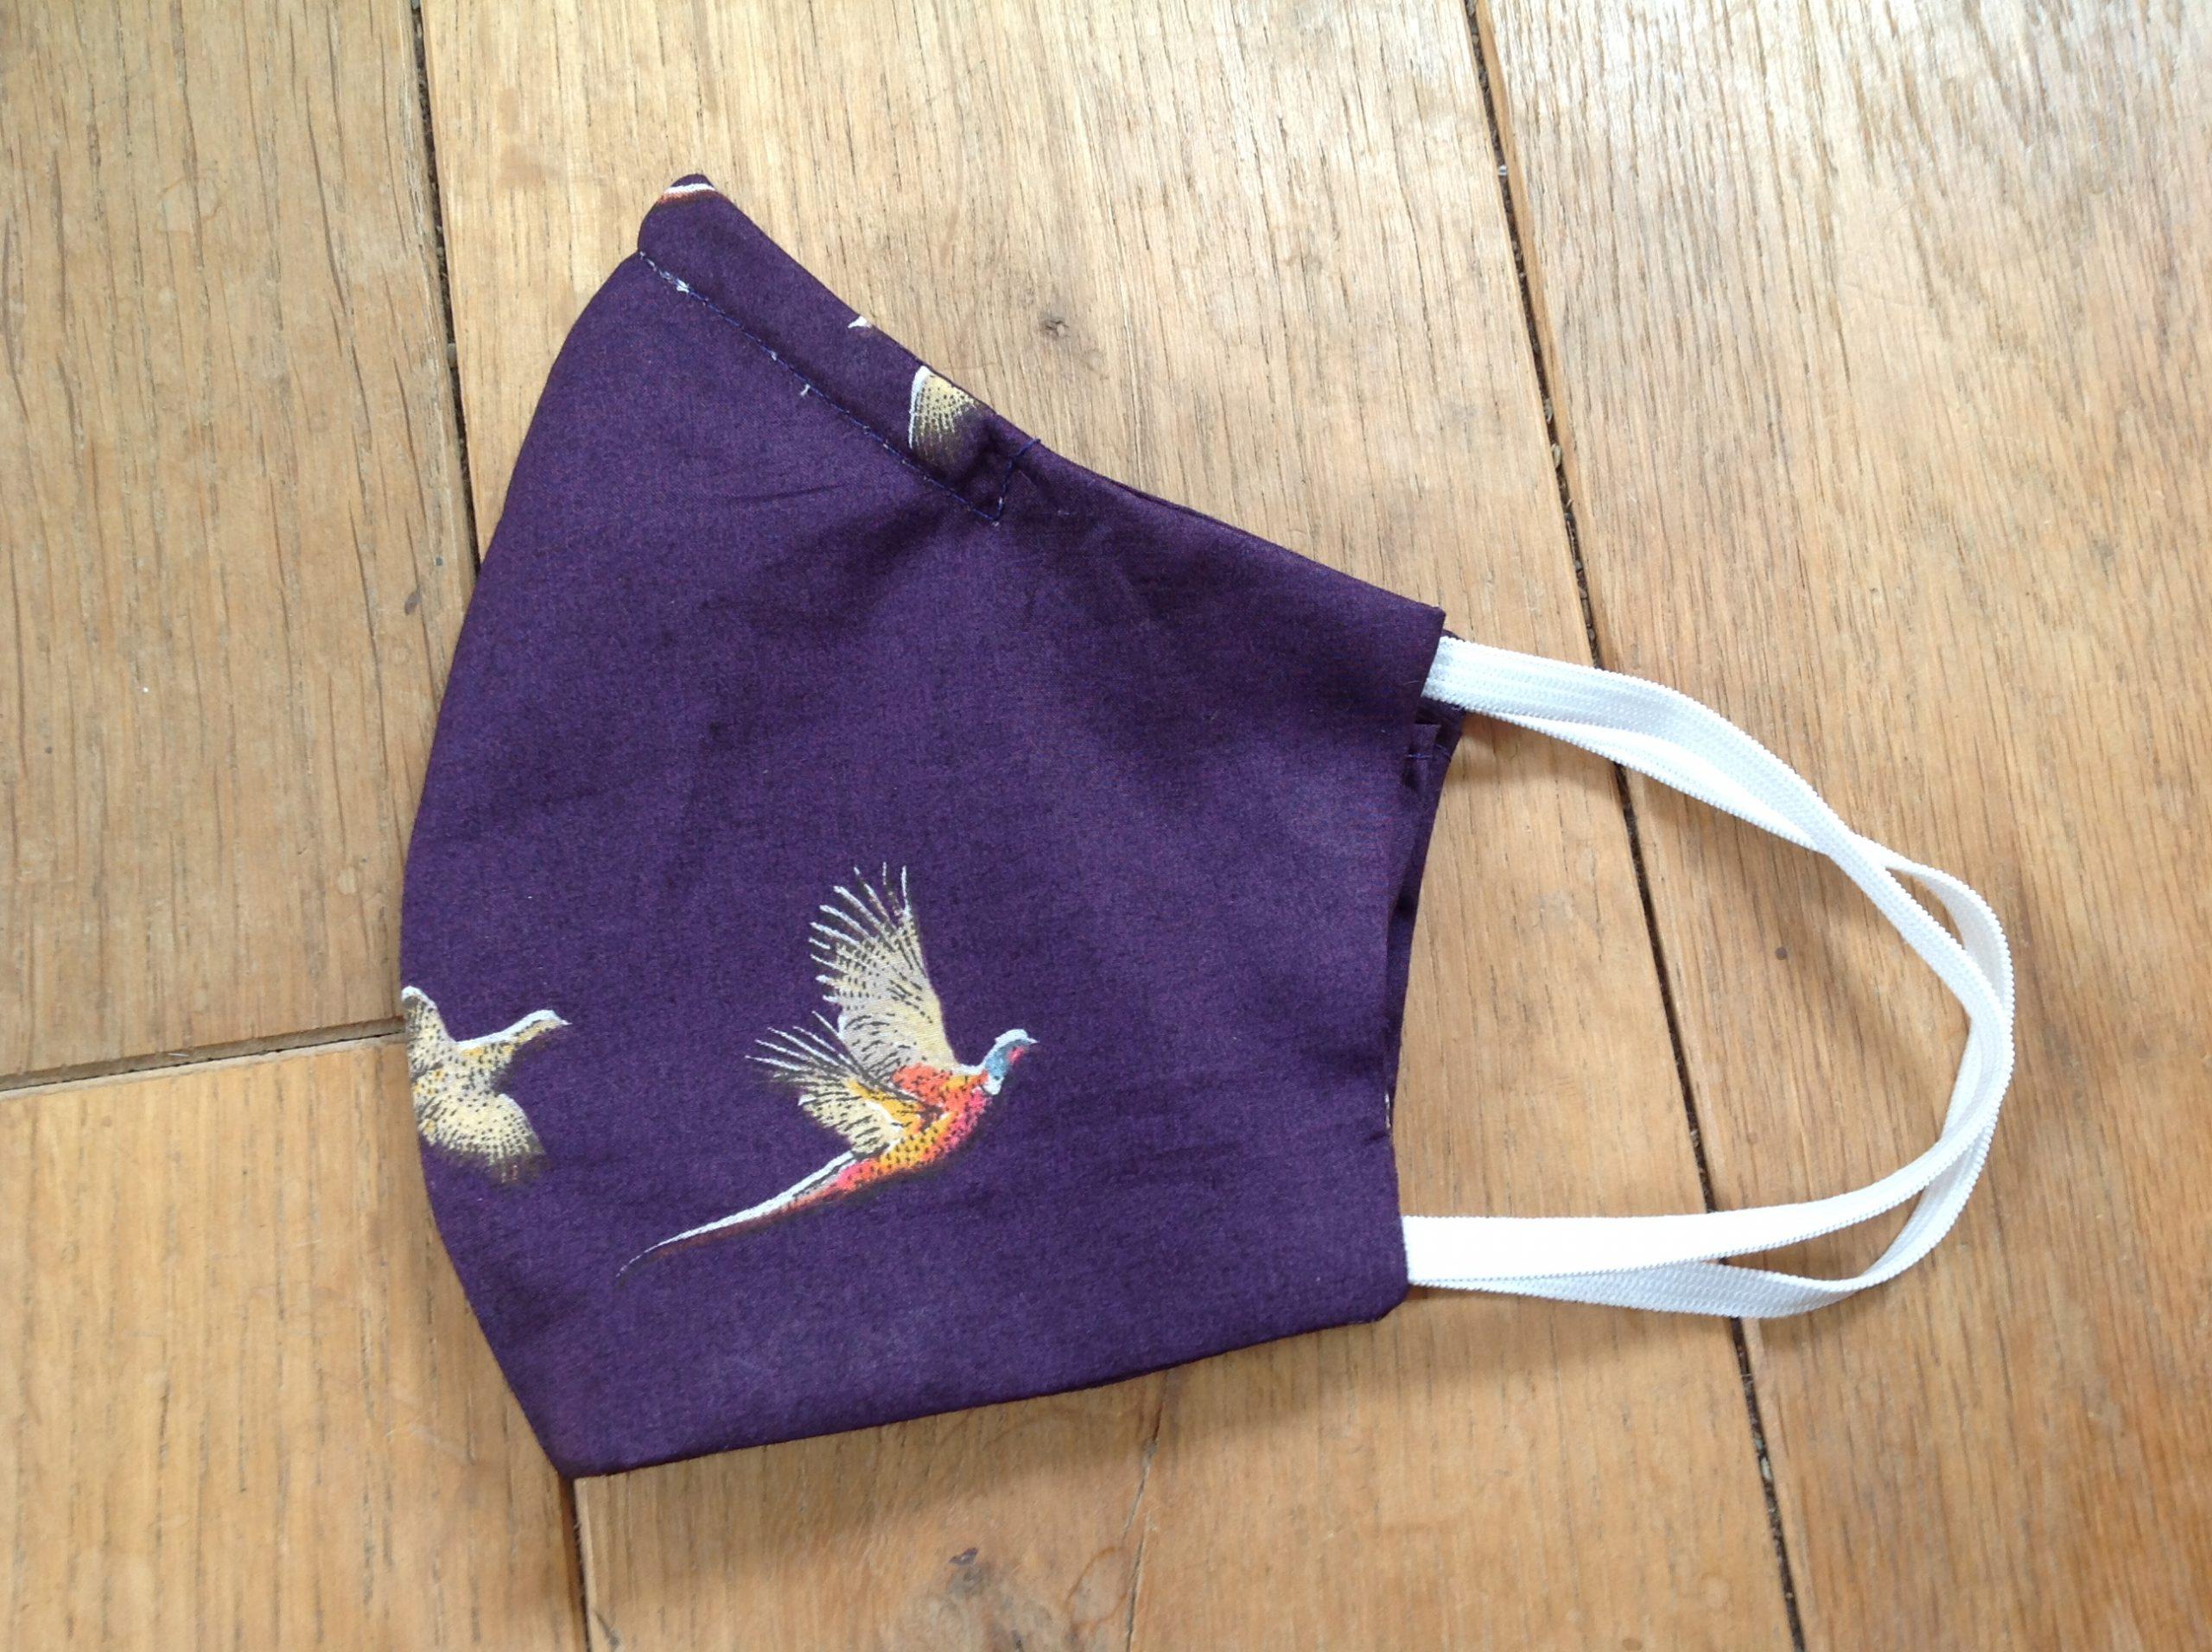 Shaped face covering - tana lawn cotton Pheasants purple